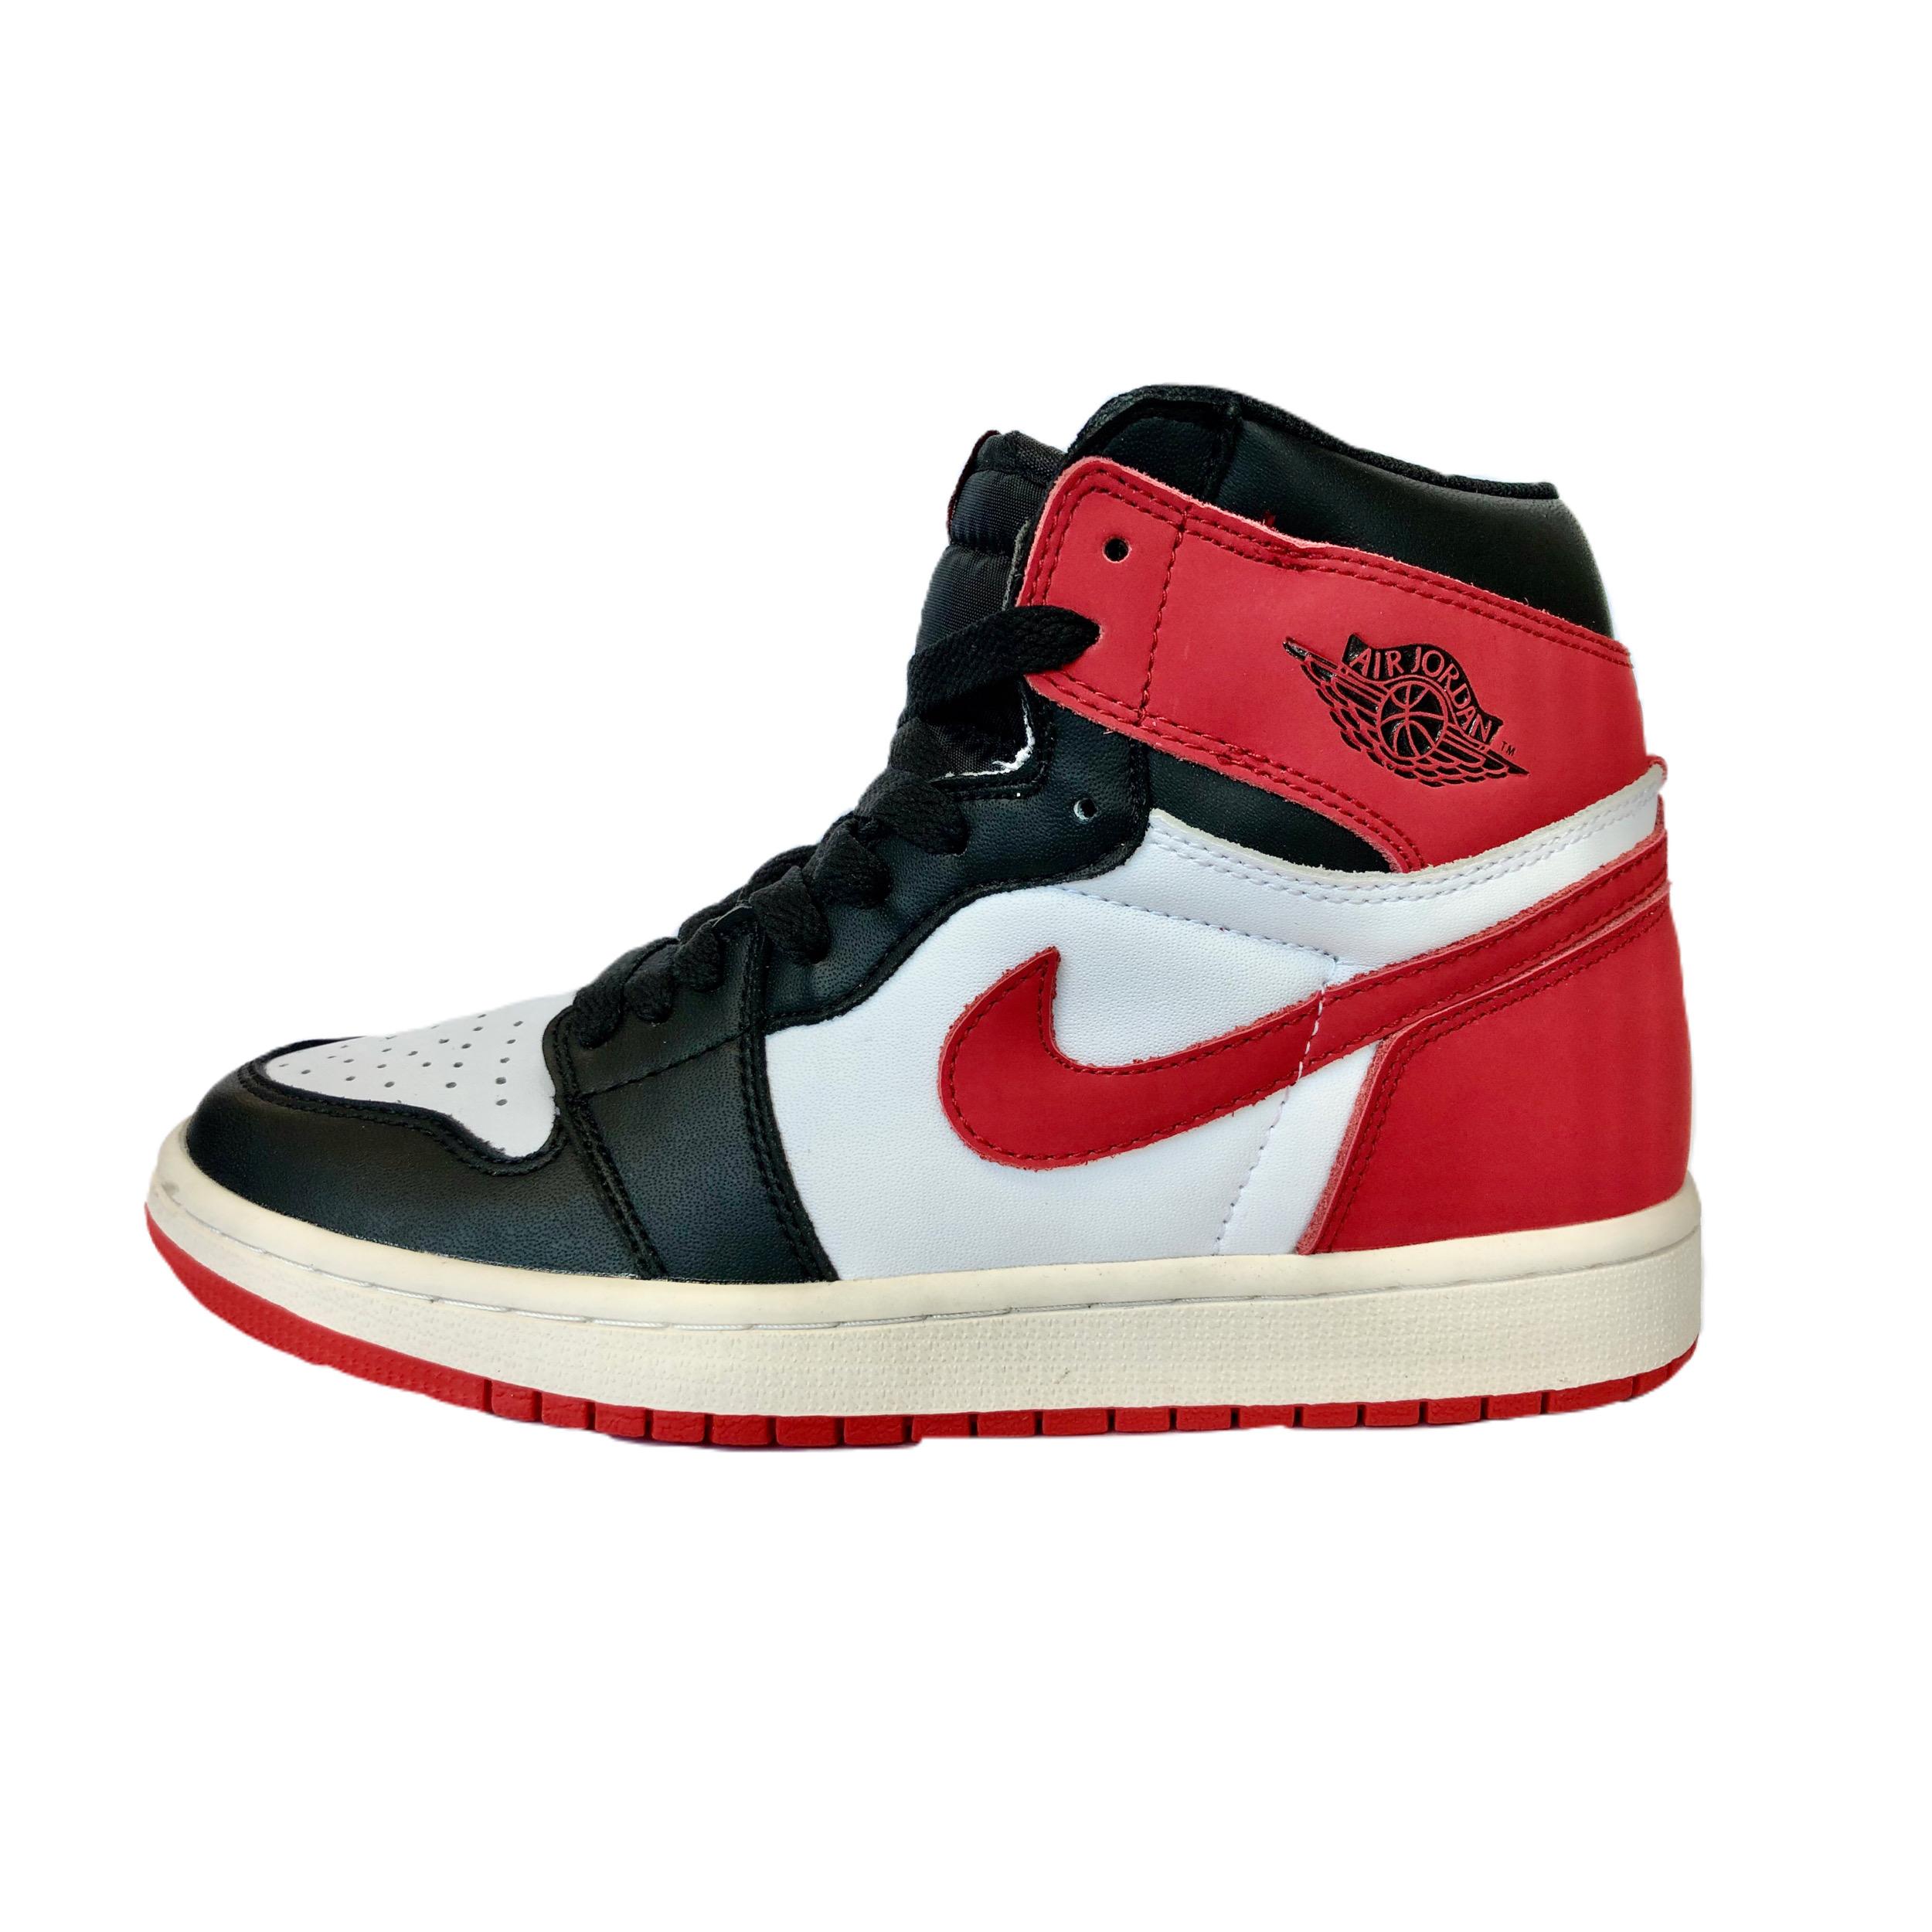 کفش راحتی زنانه نایکی مدل AIR JORDAN 1 RETRO HIGH OG 555088 112